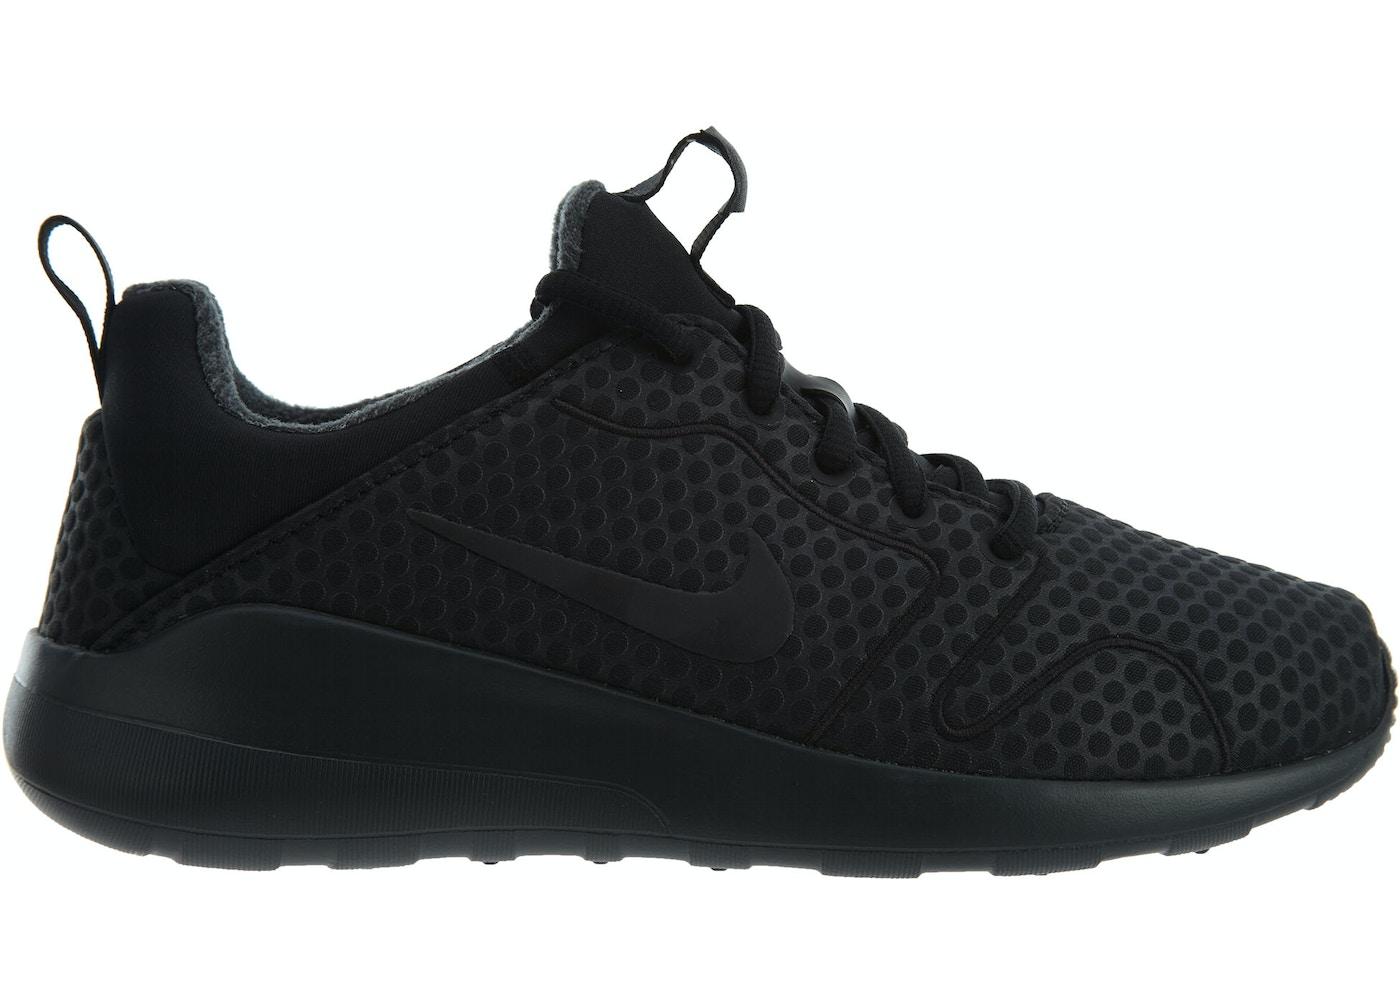 huge discount 0d881 21083 Nike Kaishi 2.0 Se Black Black-Anthracite - 844838-009